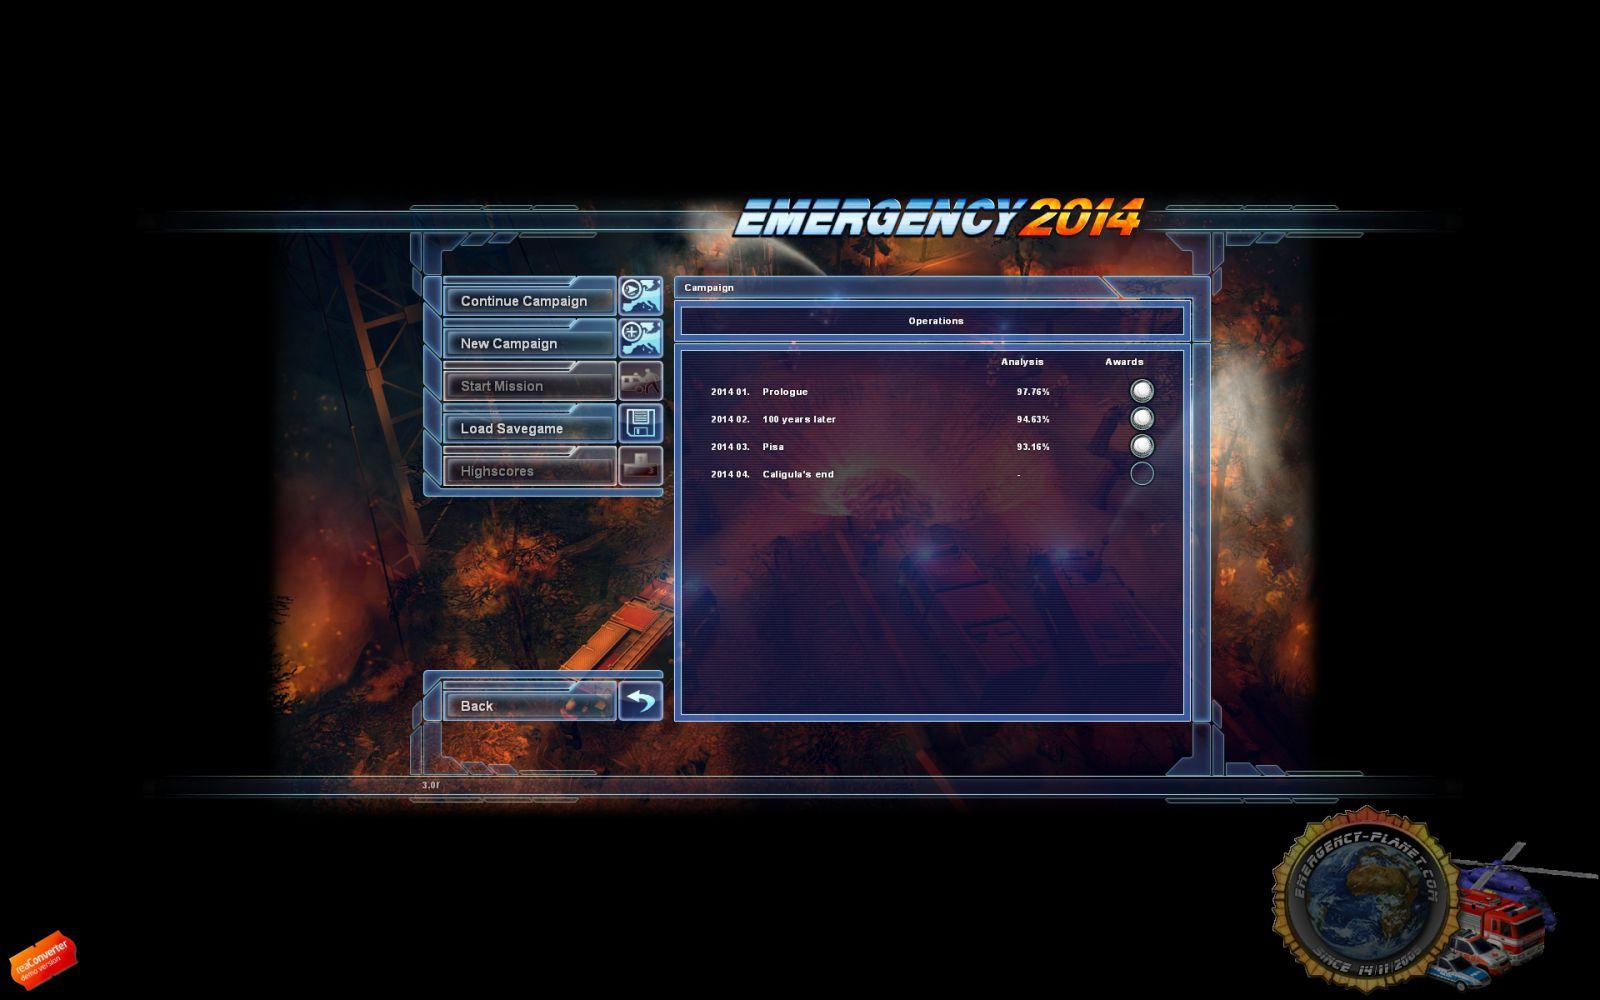 Emergency 2014 Screenshot 27